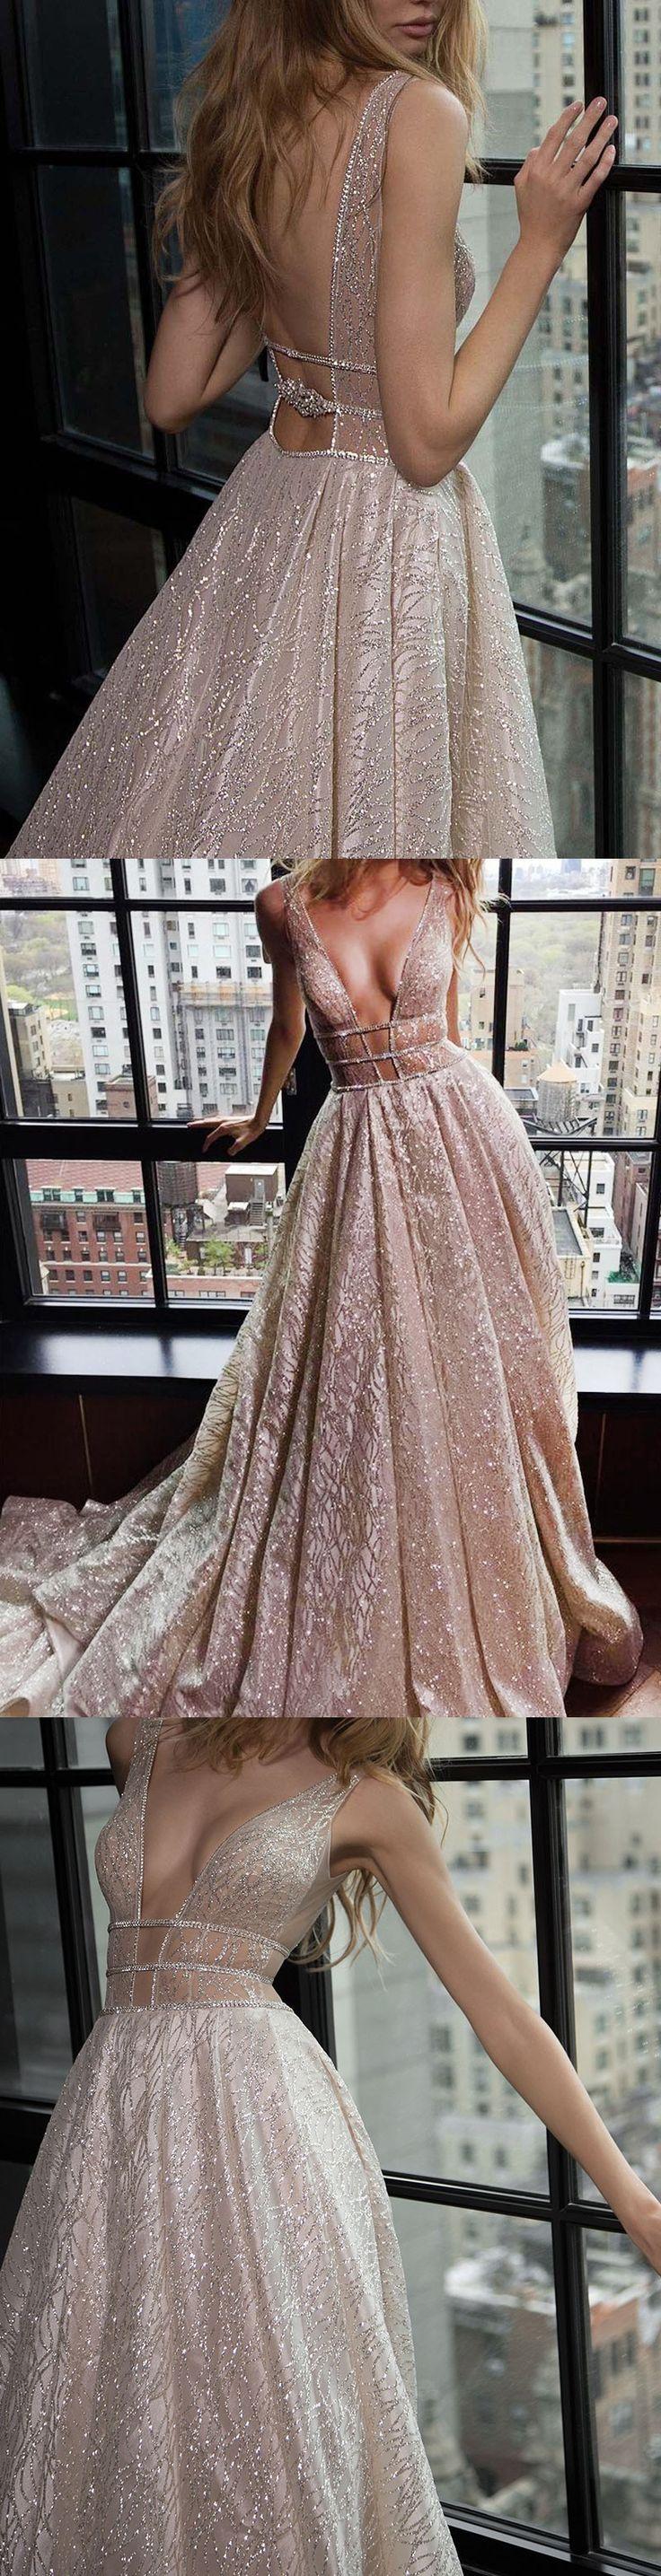 v neck prom dresses, plunging prom dresses, backless prom dresses, champagne prom dresses, sequined prom dresses